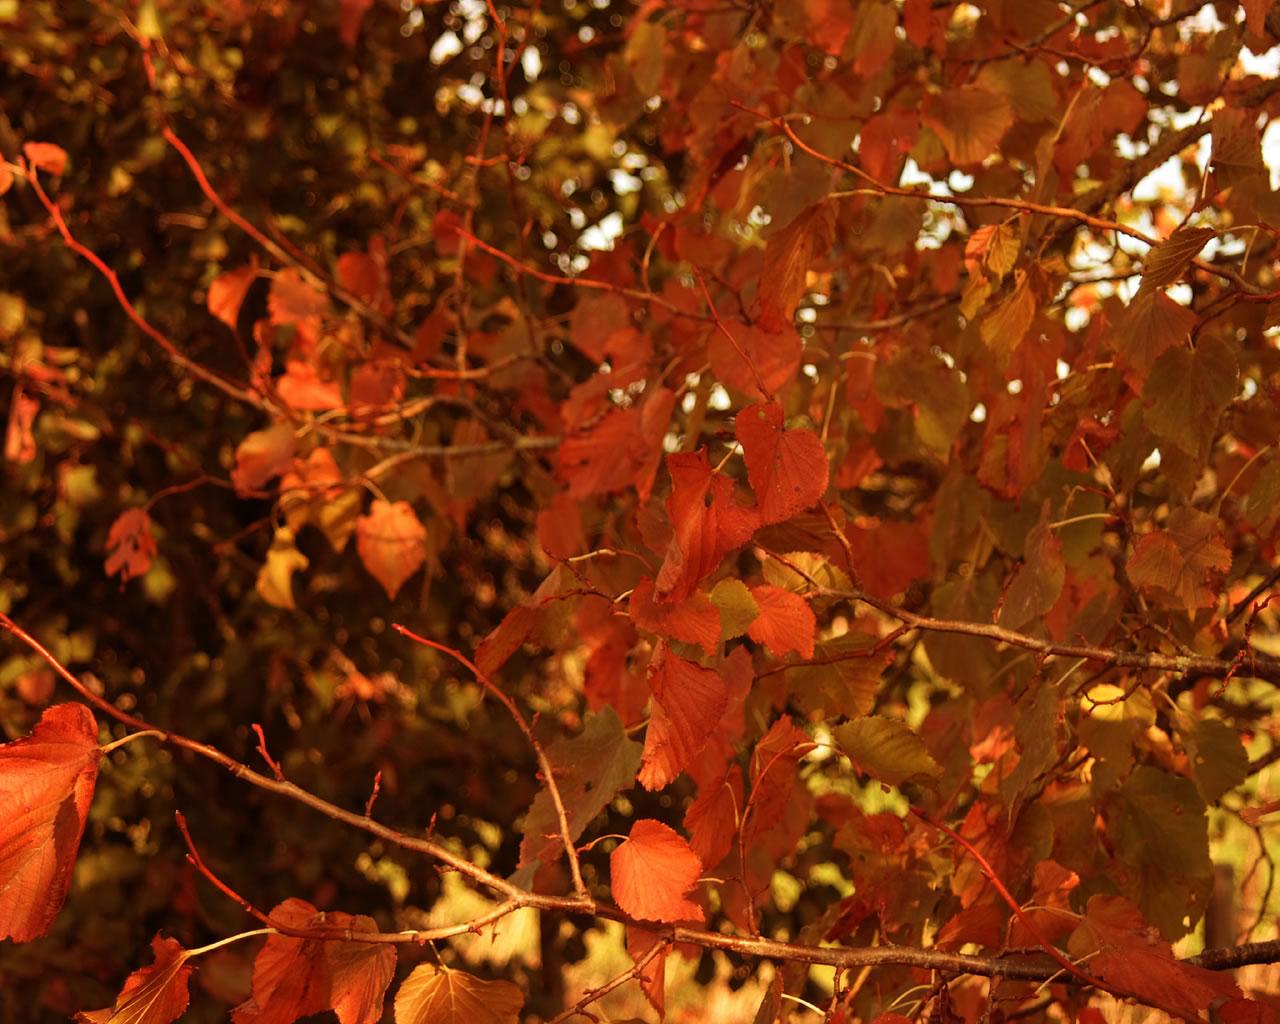 autumn wallpaper windows 7 With Resolutions 12801024 Pixel 1280x1024